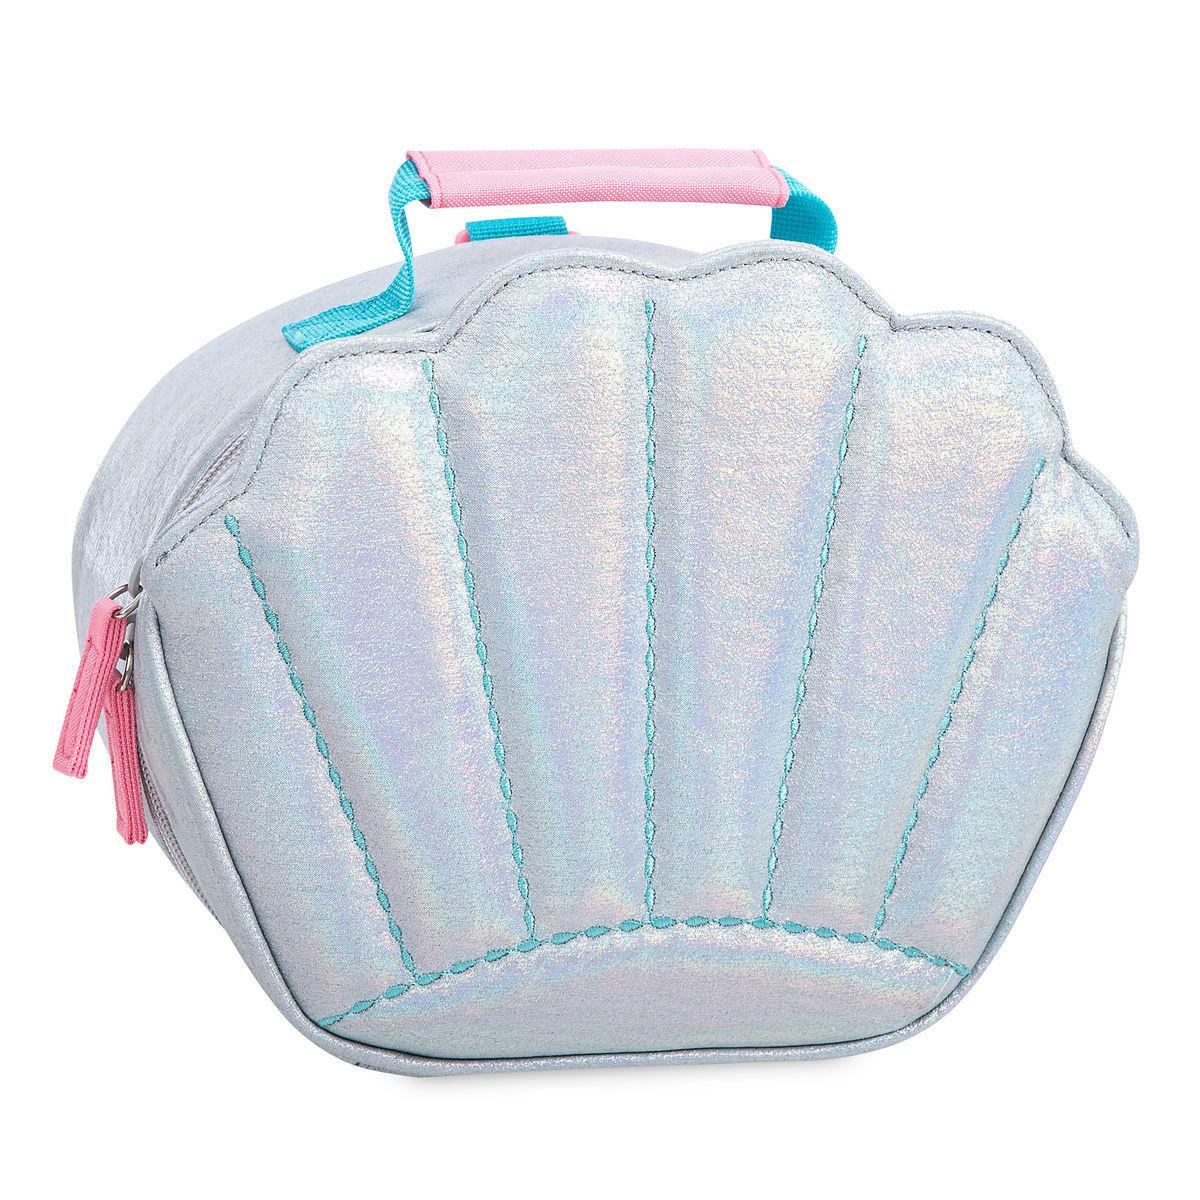 back to school supplies best disney merchandise ariel little mermaid lunch tote bag